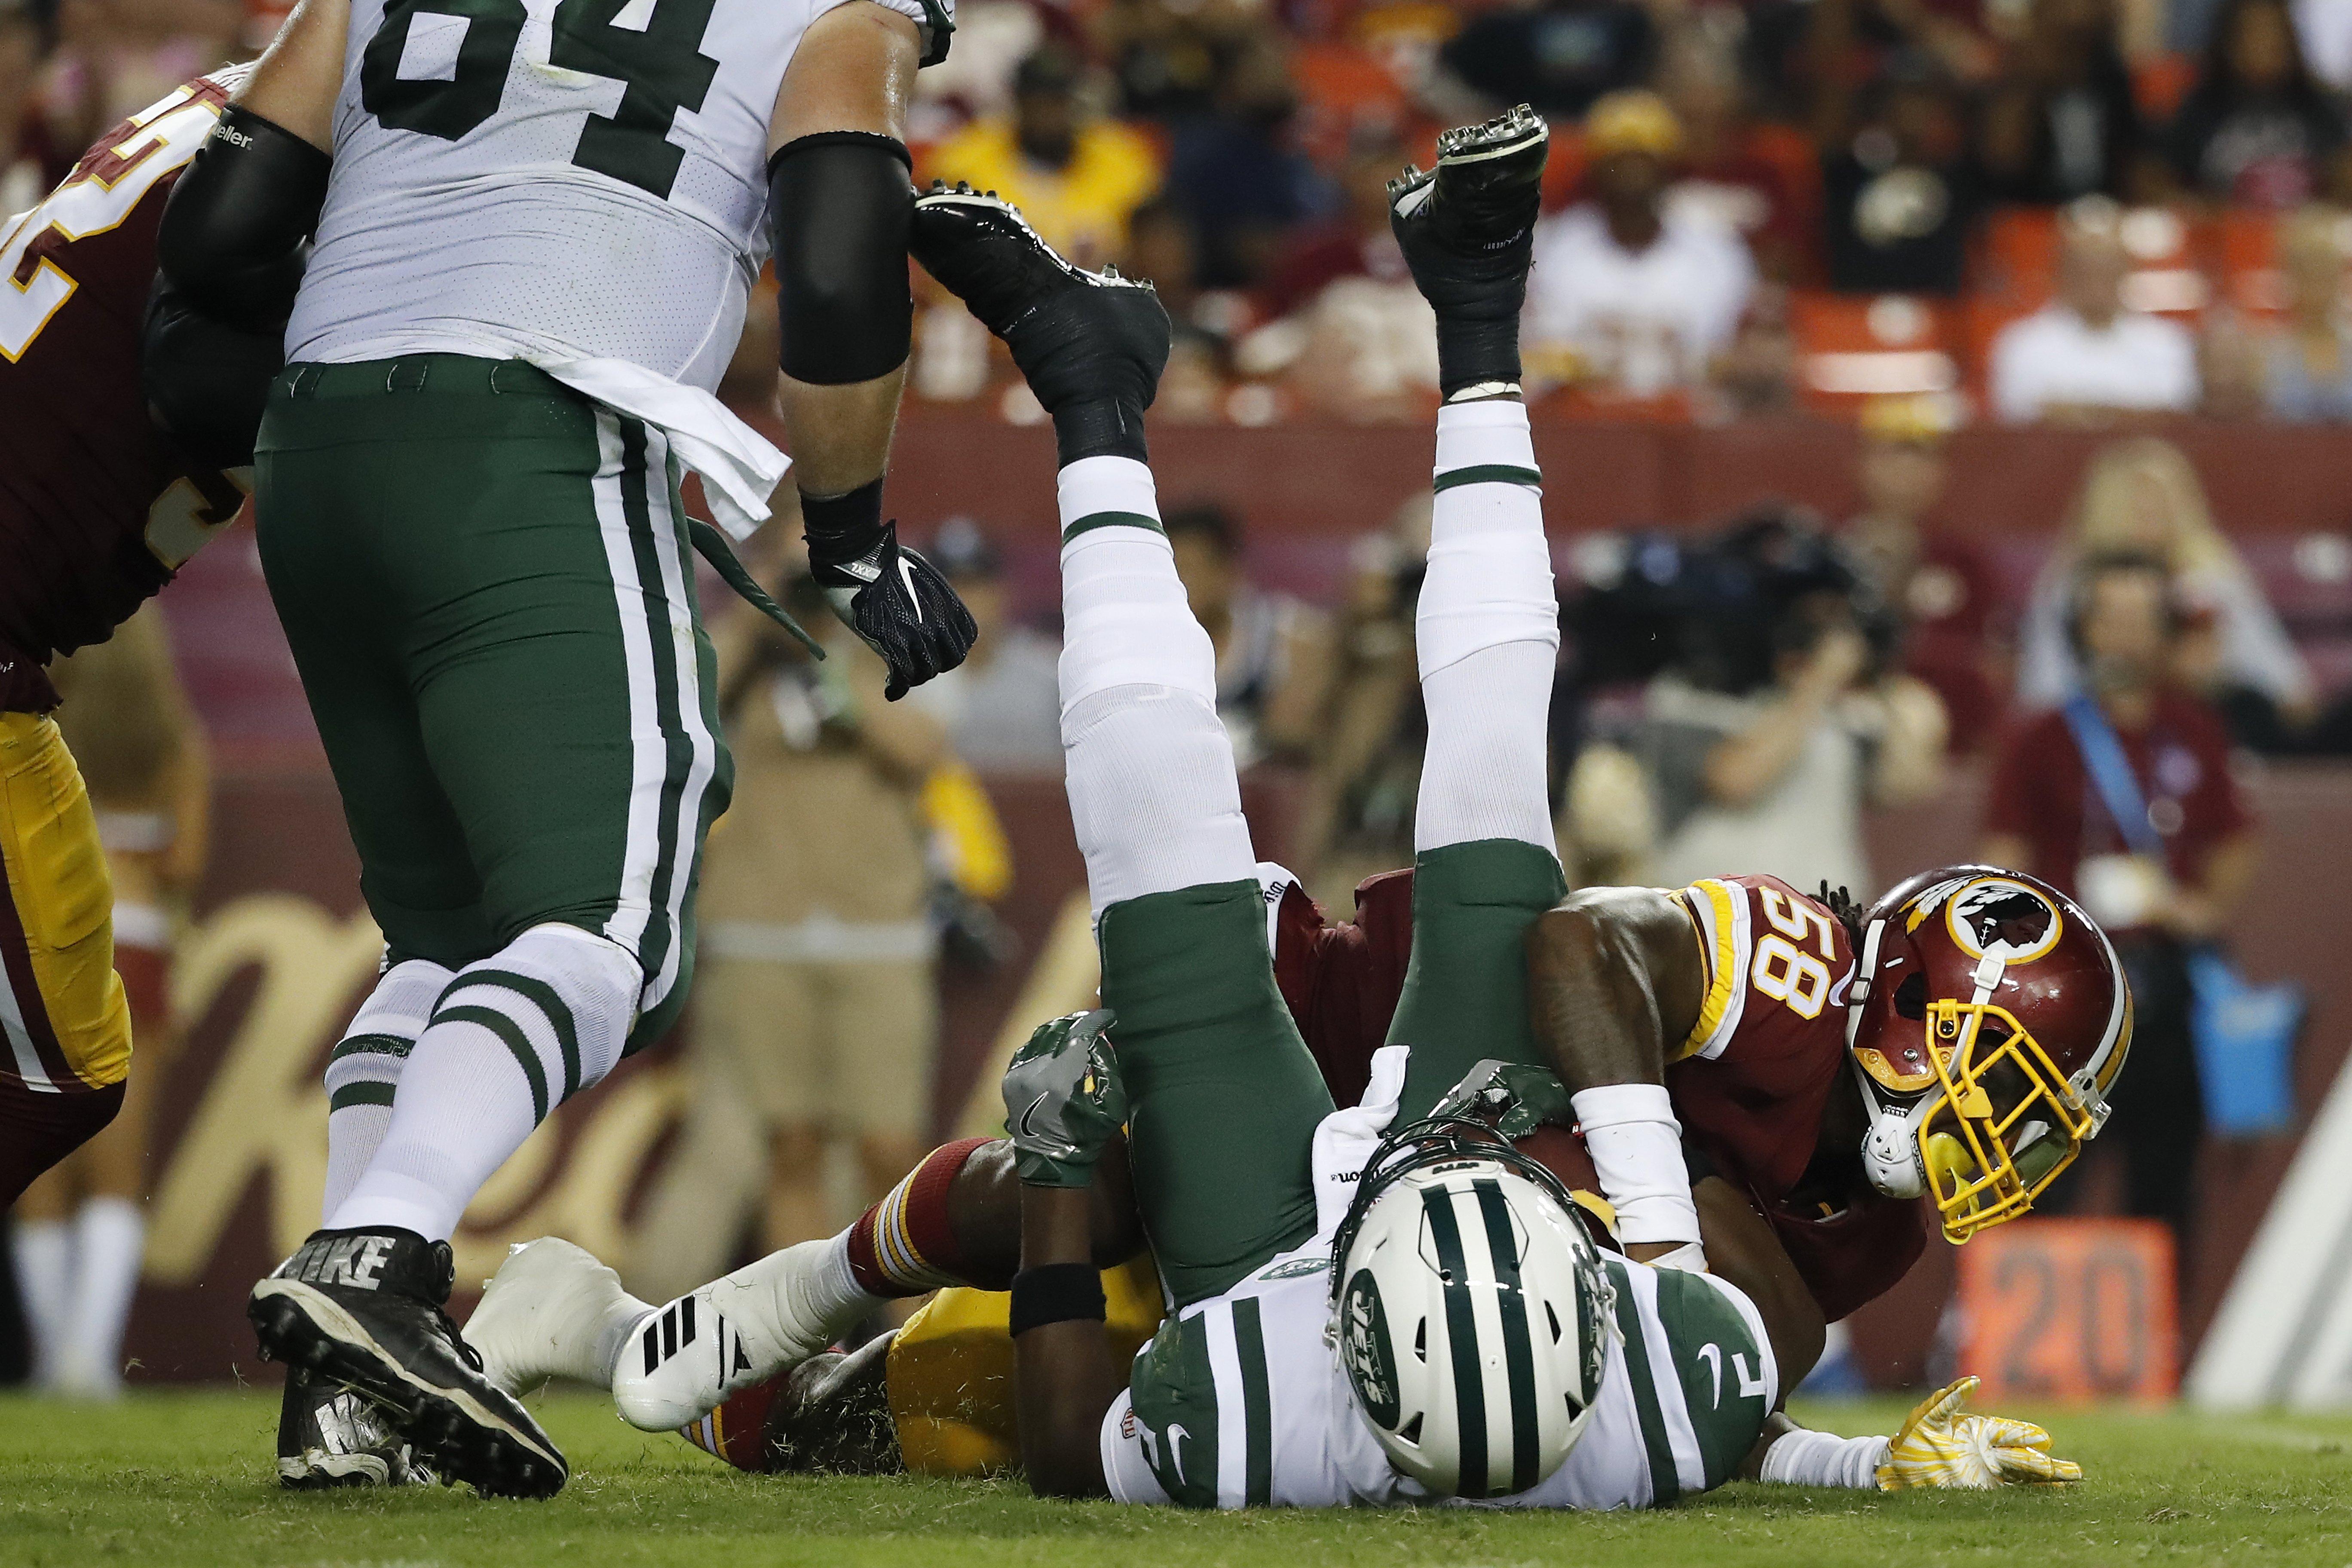 Why Jets QB Teddy Bridgewater was happy to take a hit against Washington